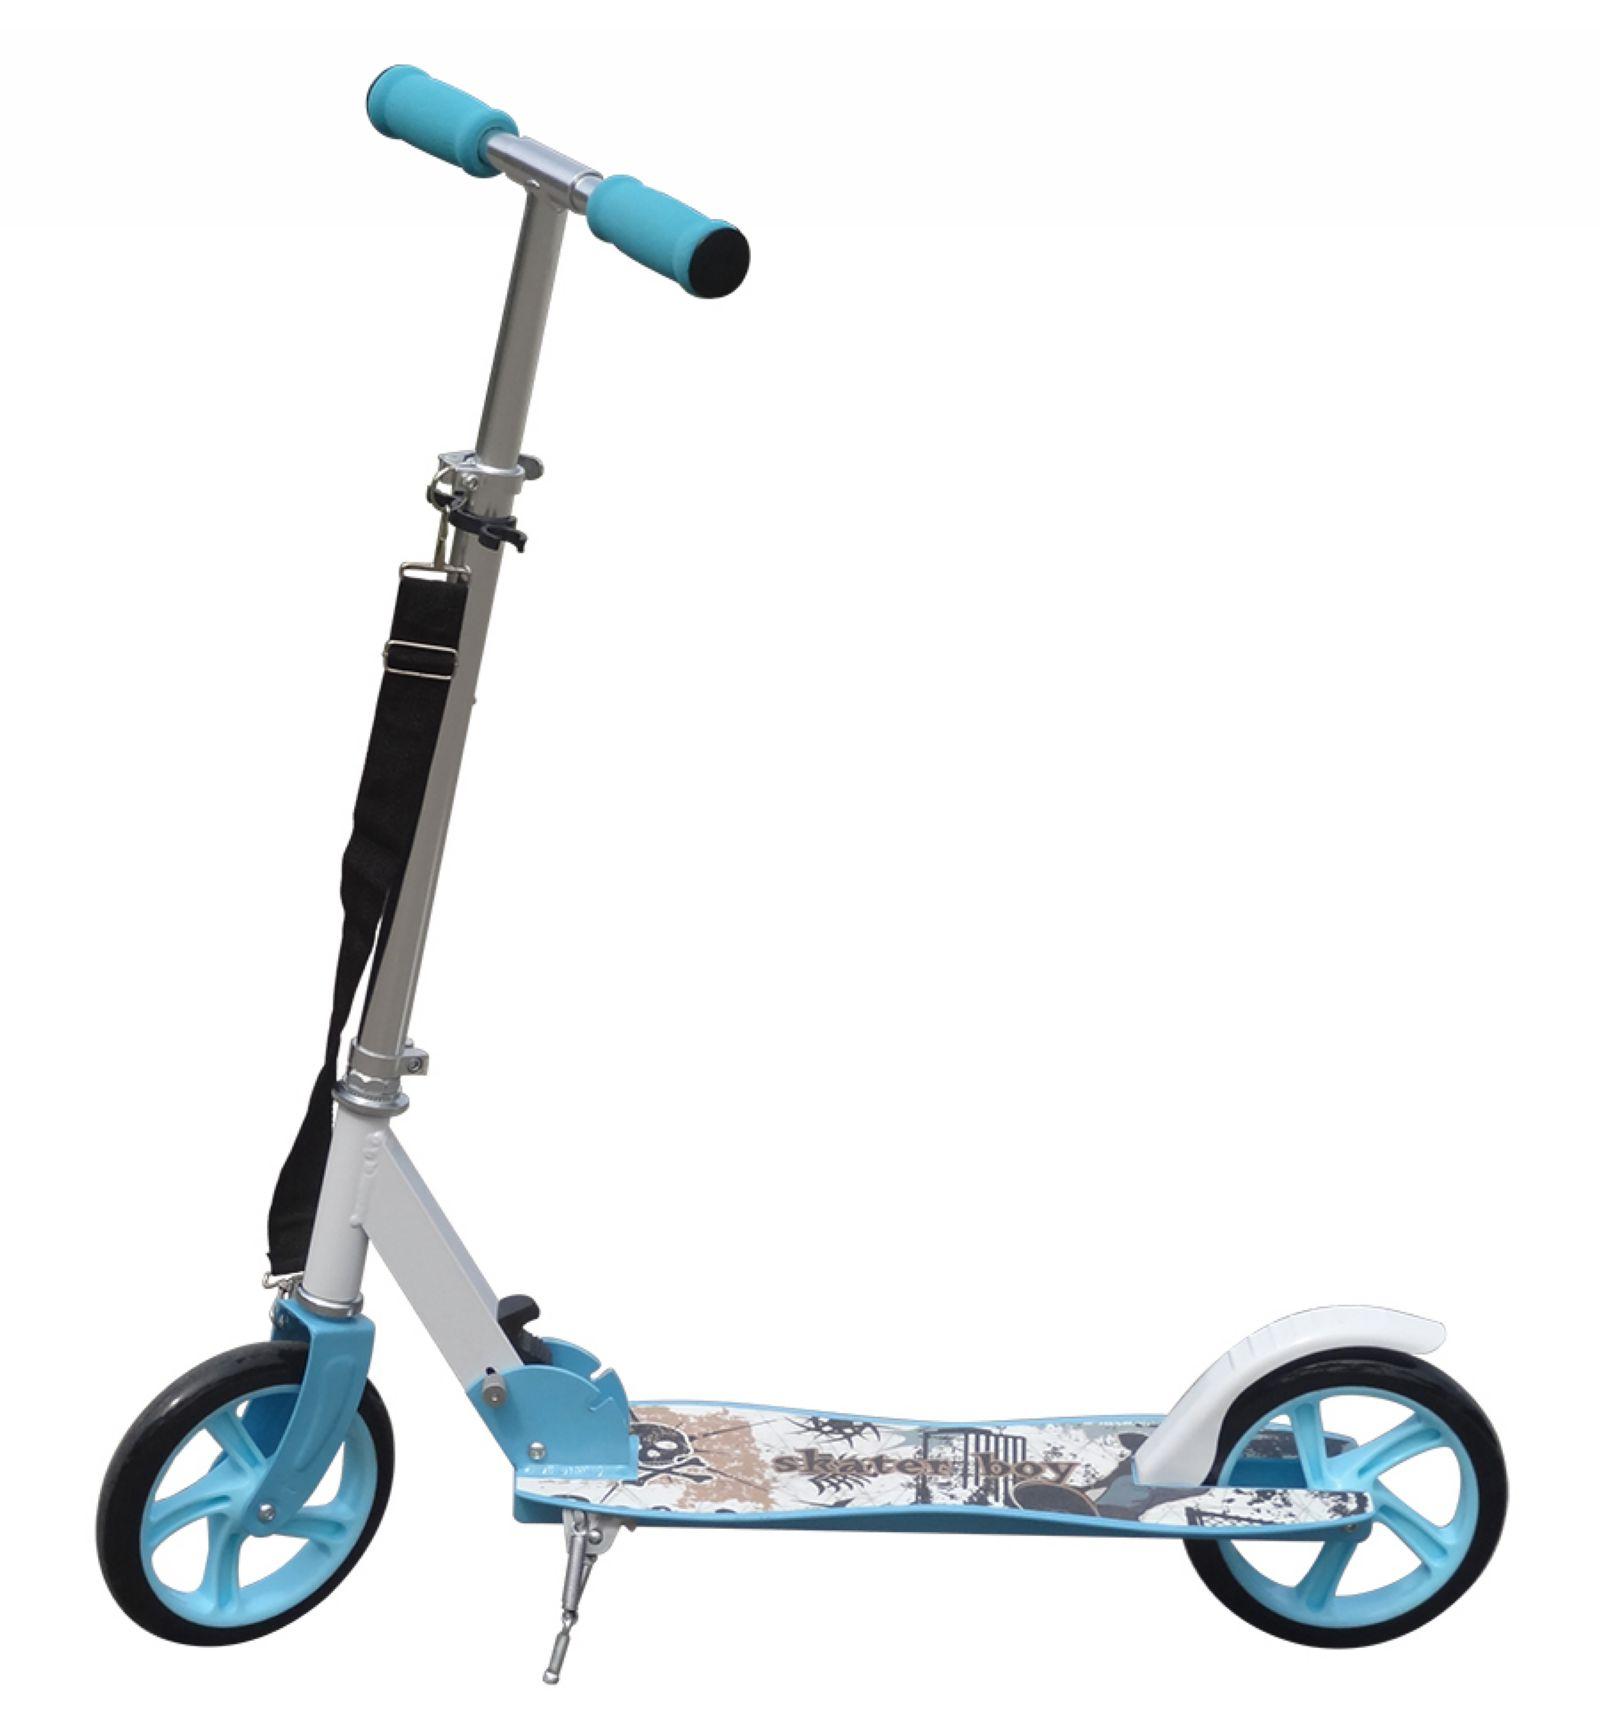 Sblue aluminium kids pro folding push urban kick scooter 2 for Big wheel motor scooter